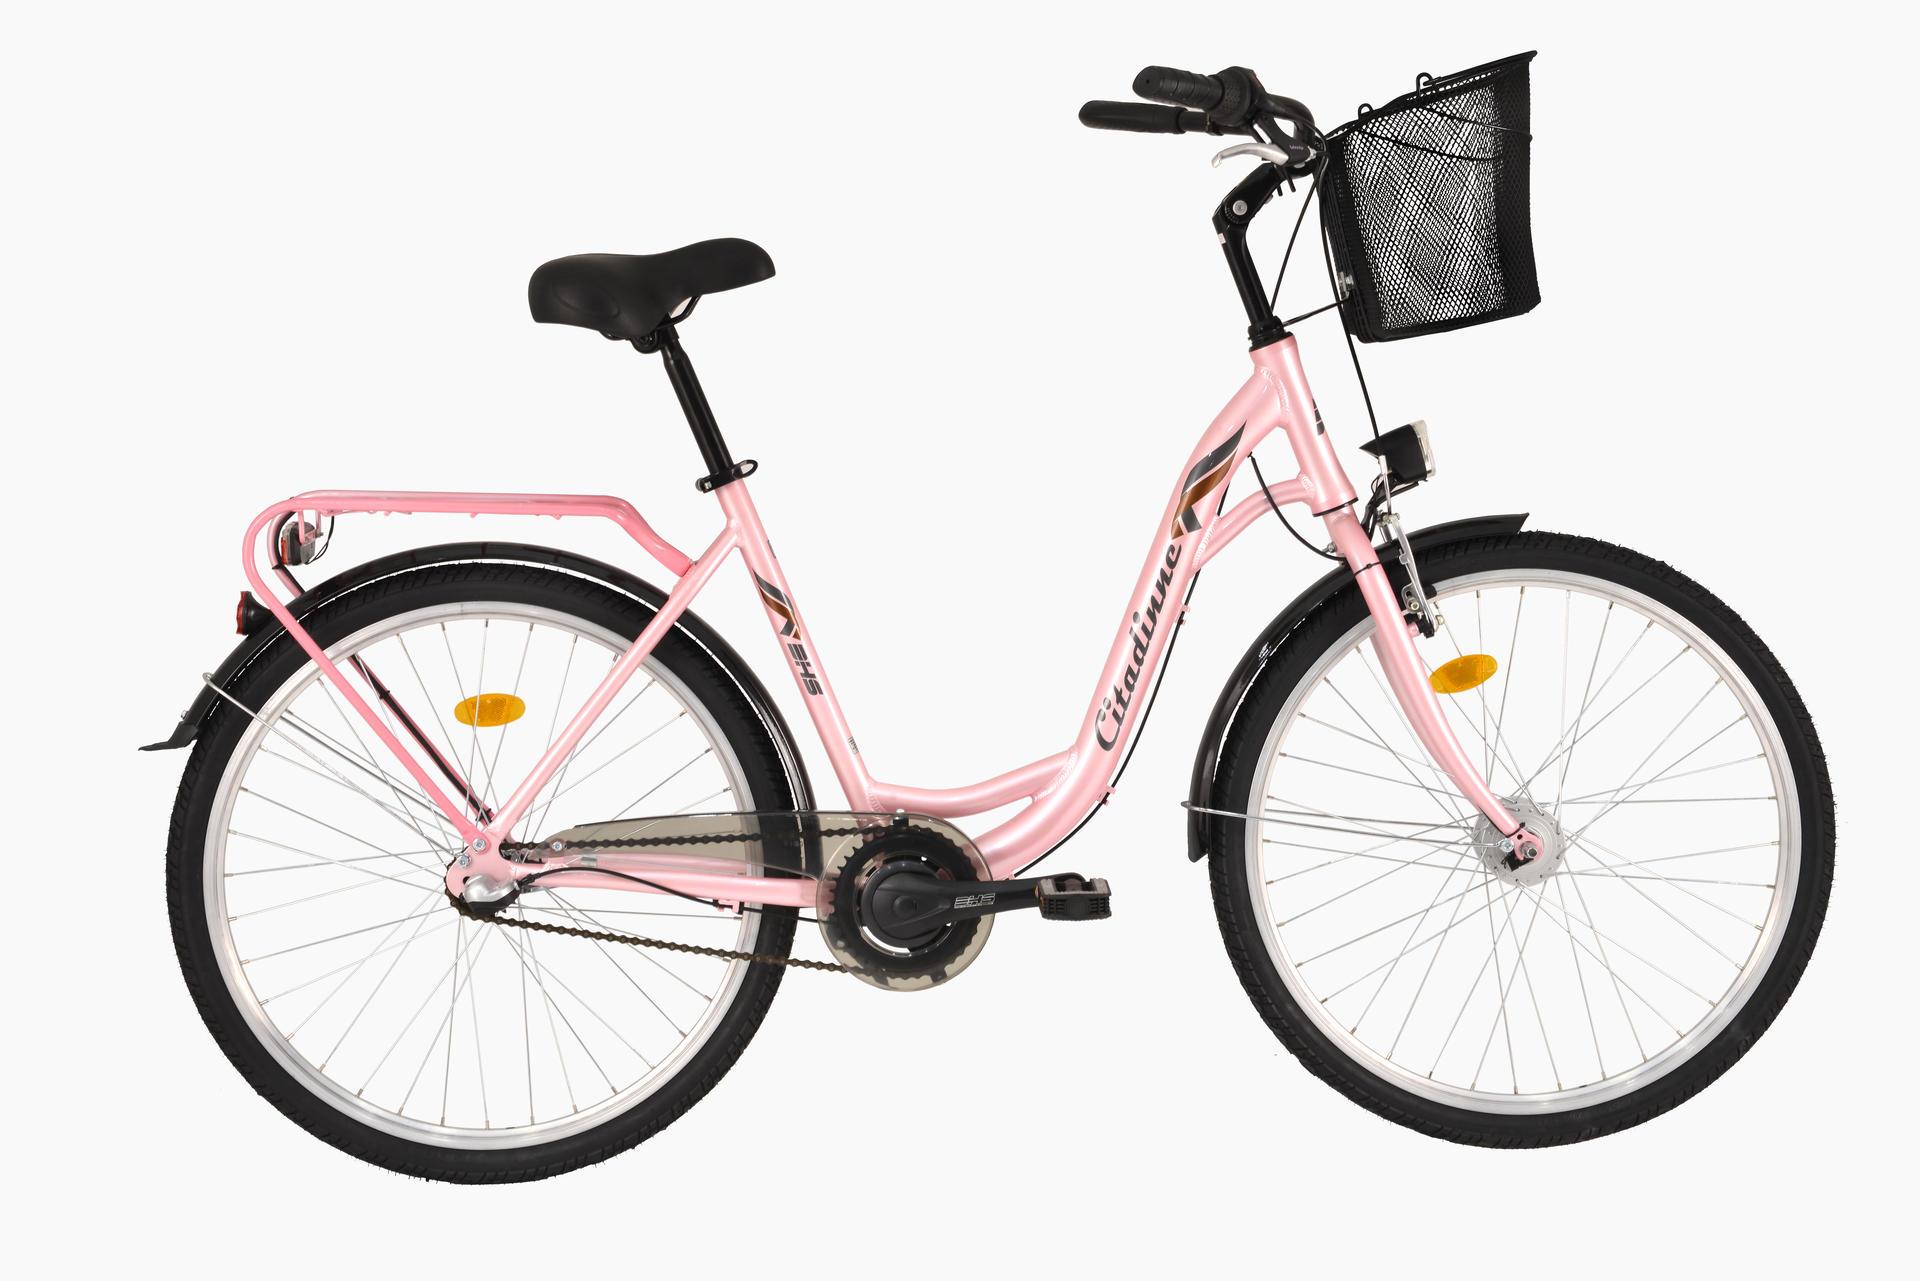 Bicicletta da città DHS Citadinne 2836 Rosa 430mm